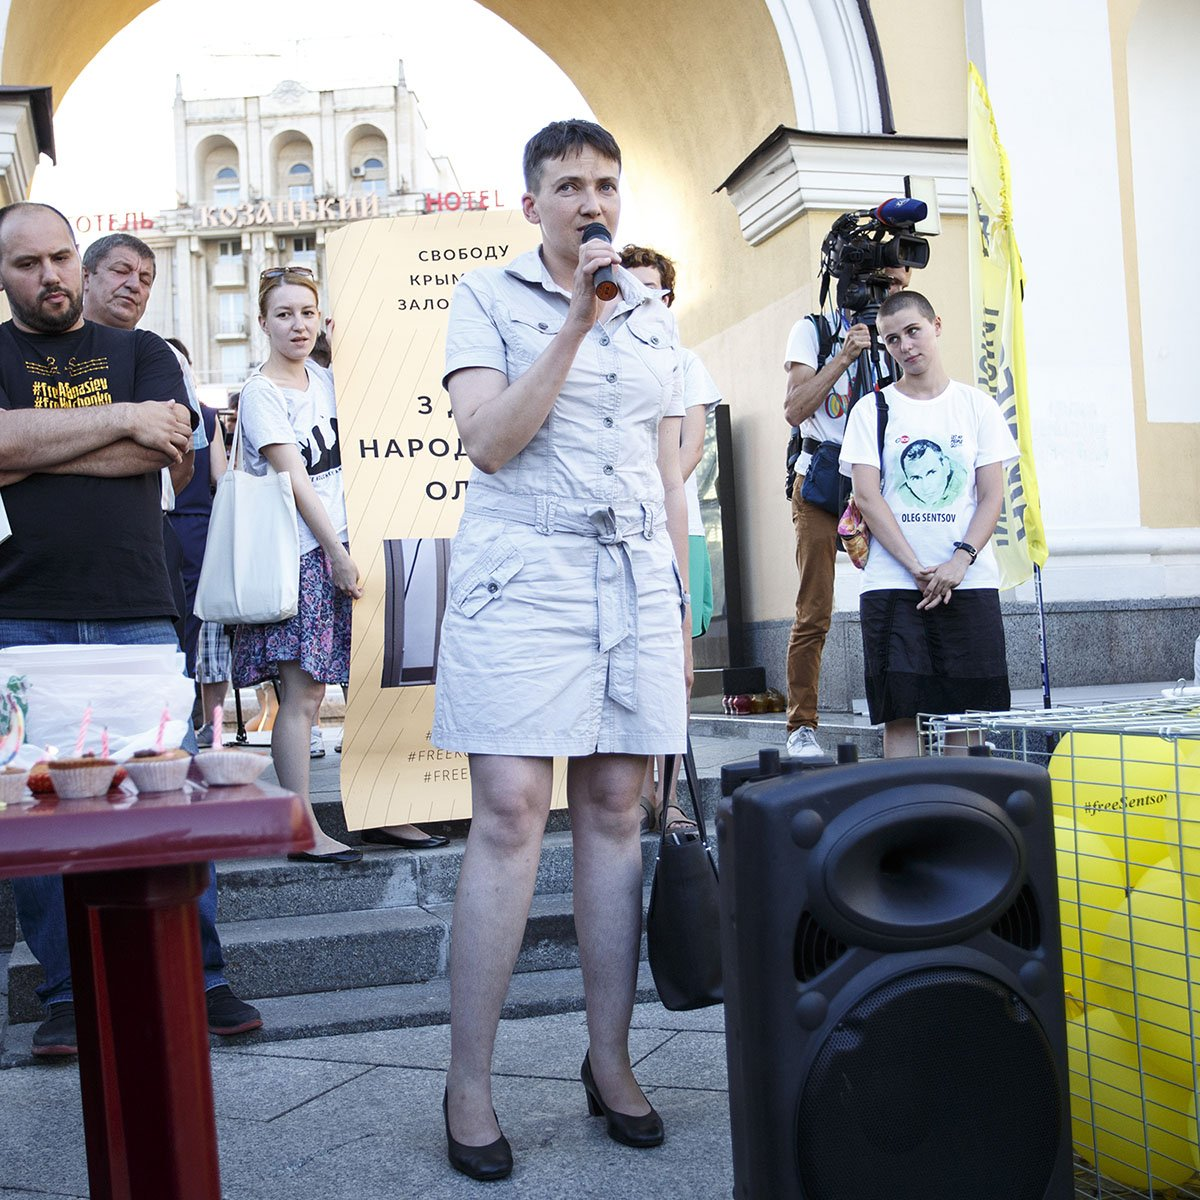 "Предприятие ""ХИМАКС"" захватывали ""титушки"" от банды Чеботарева, - нардеп заявил, что к делу причастны люди Януковича - Цензор.НЕТ 687"